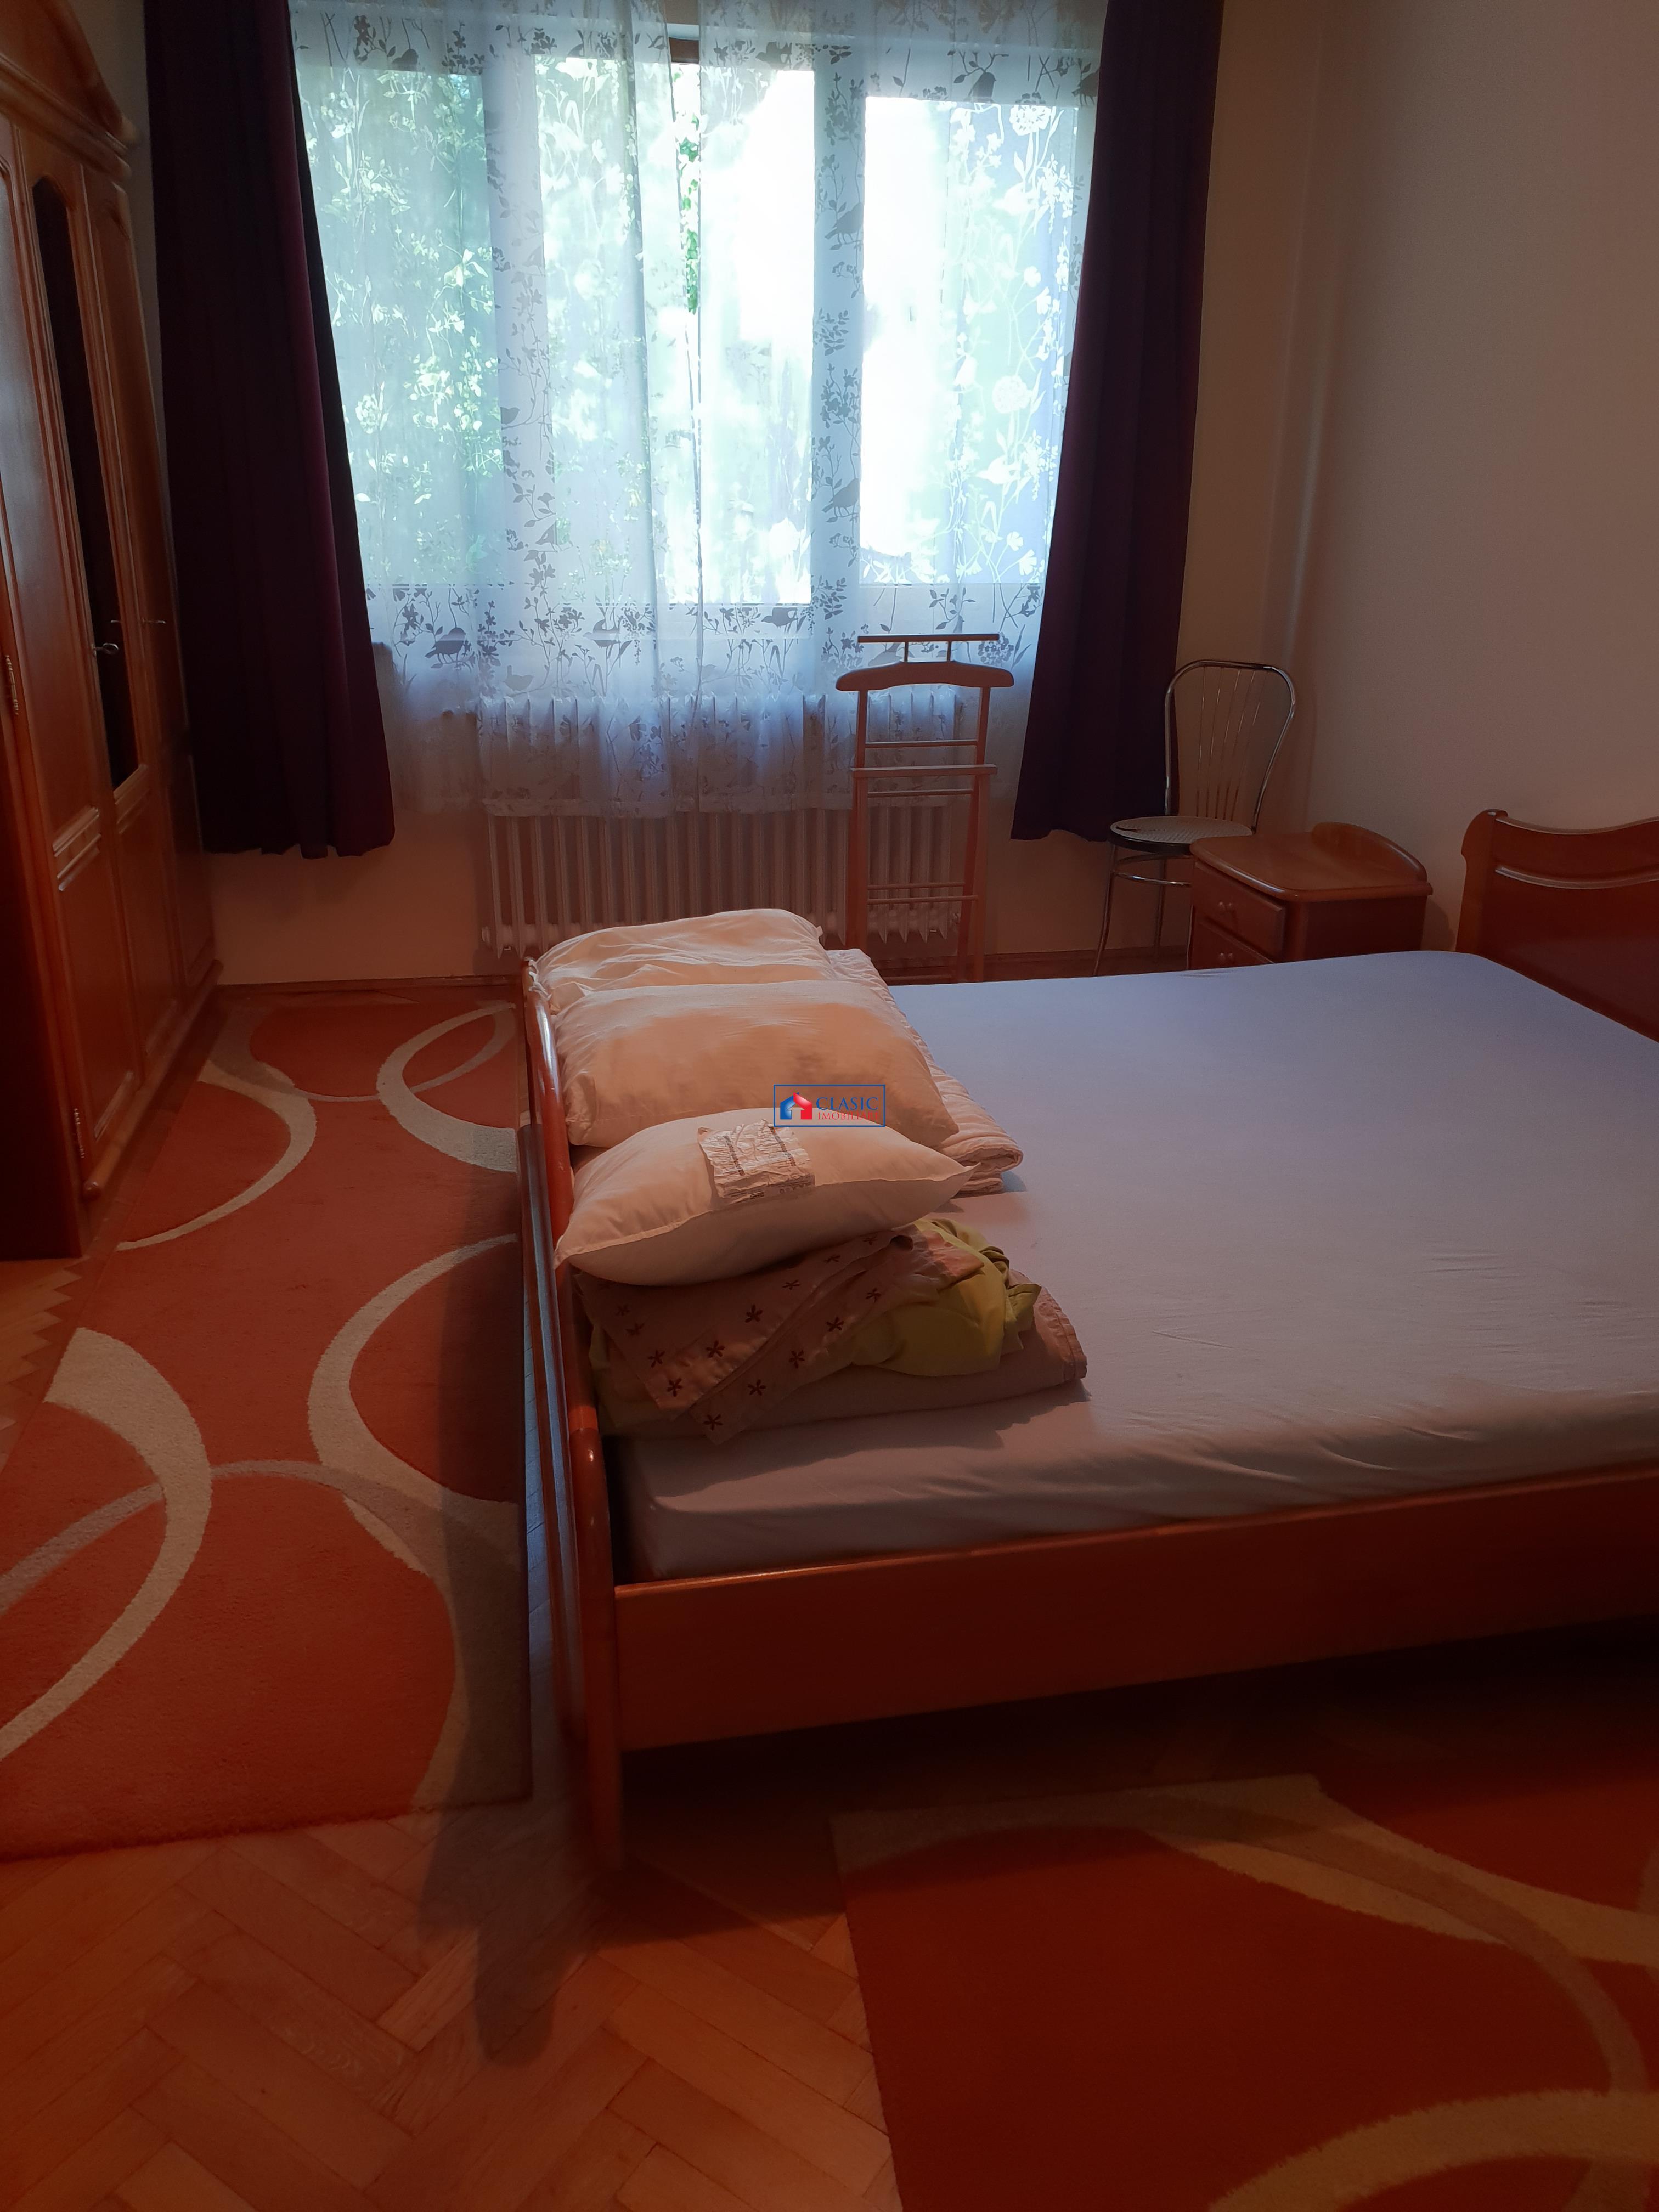 Inchiriere Apartament 3 camere modern in Plopilor, Cluj Napoca